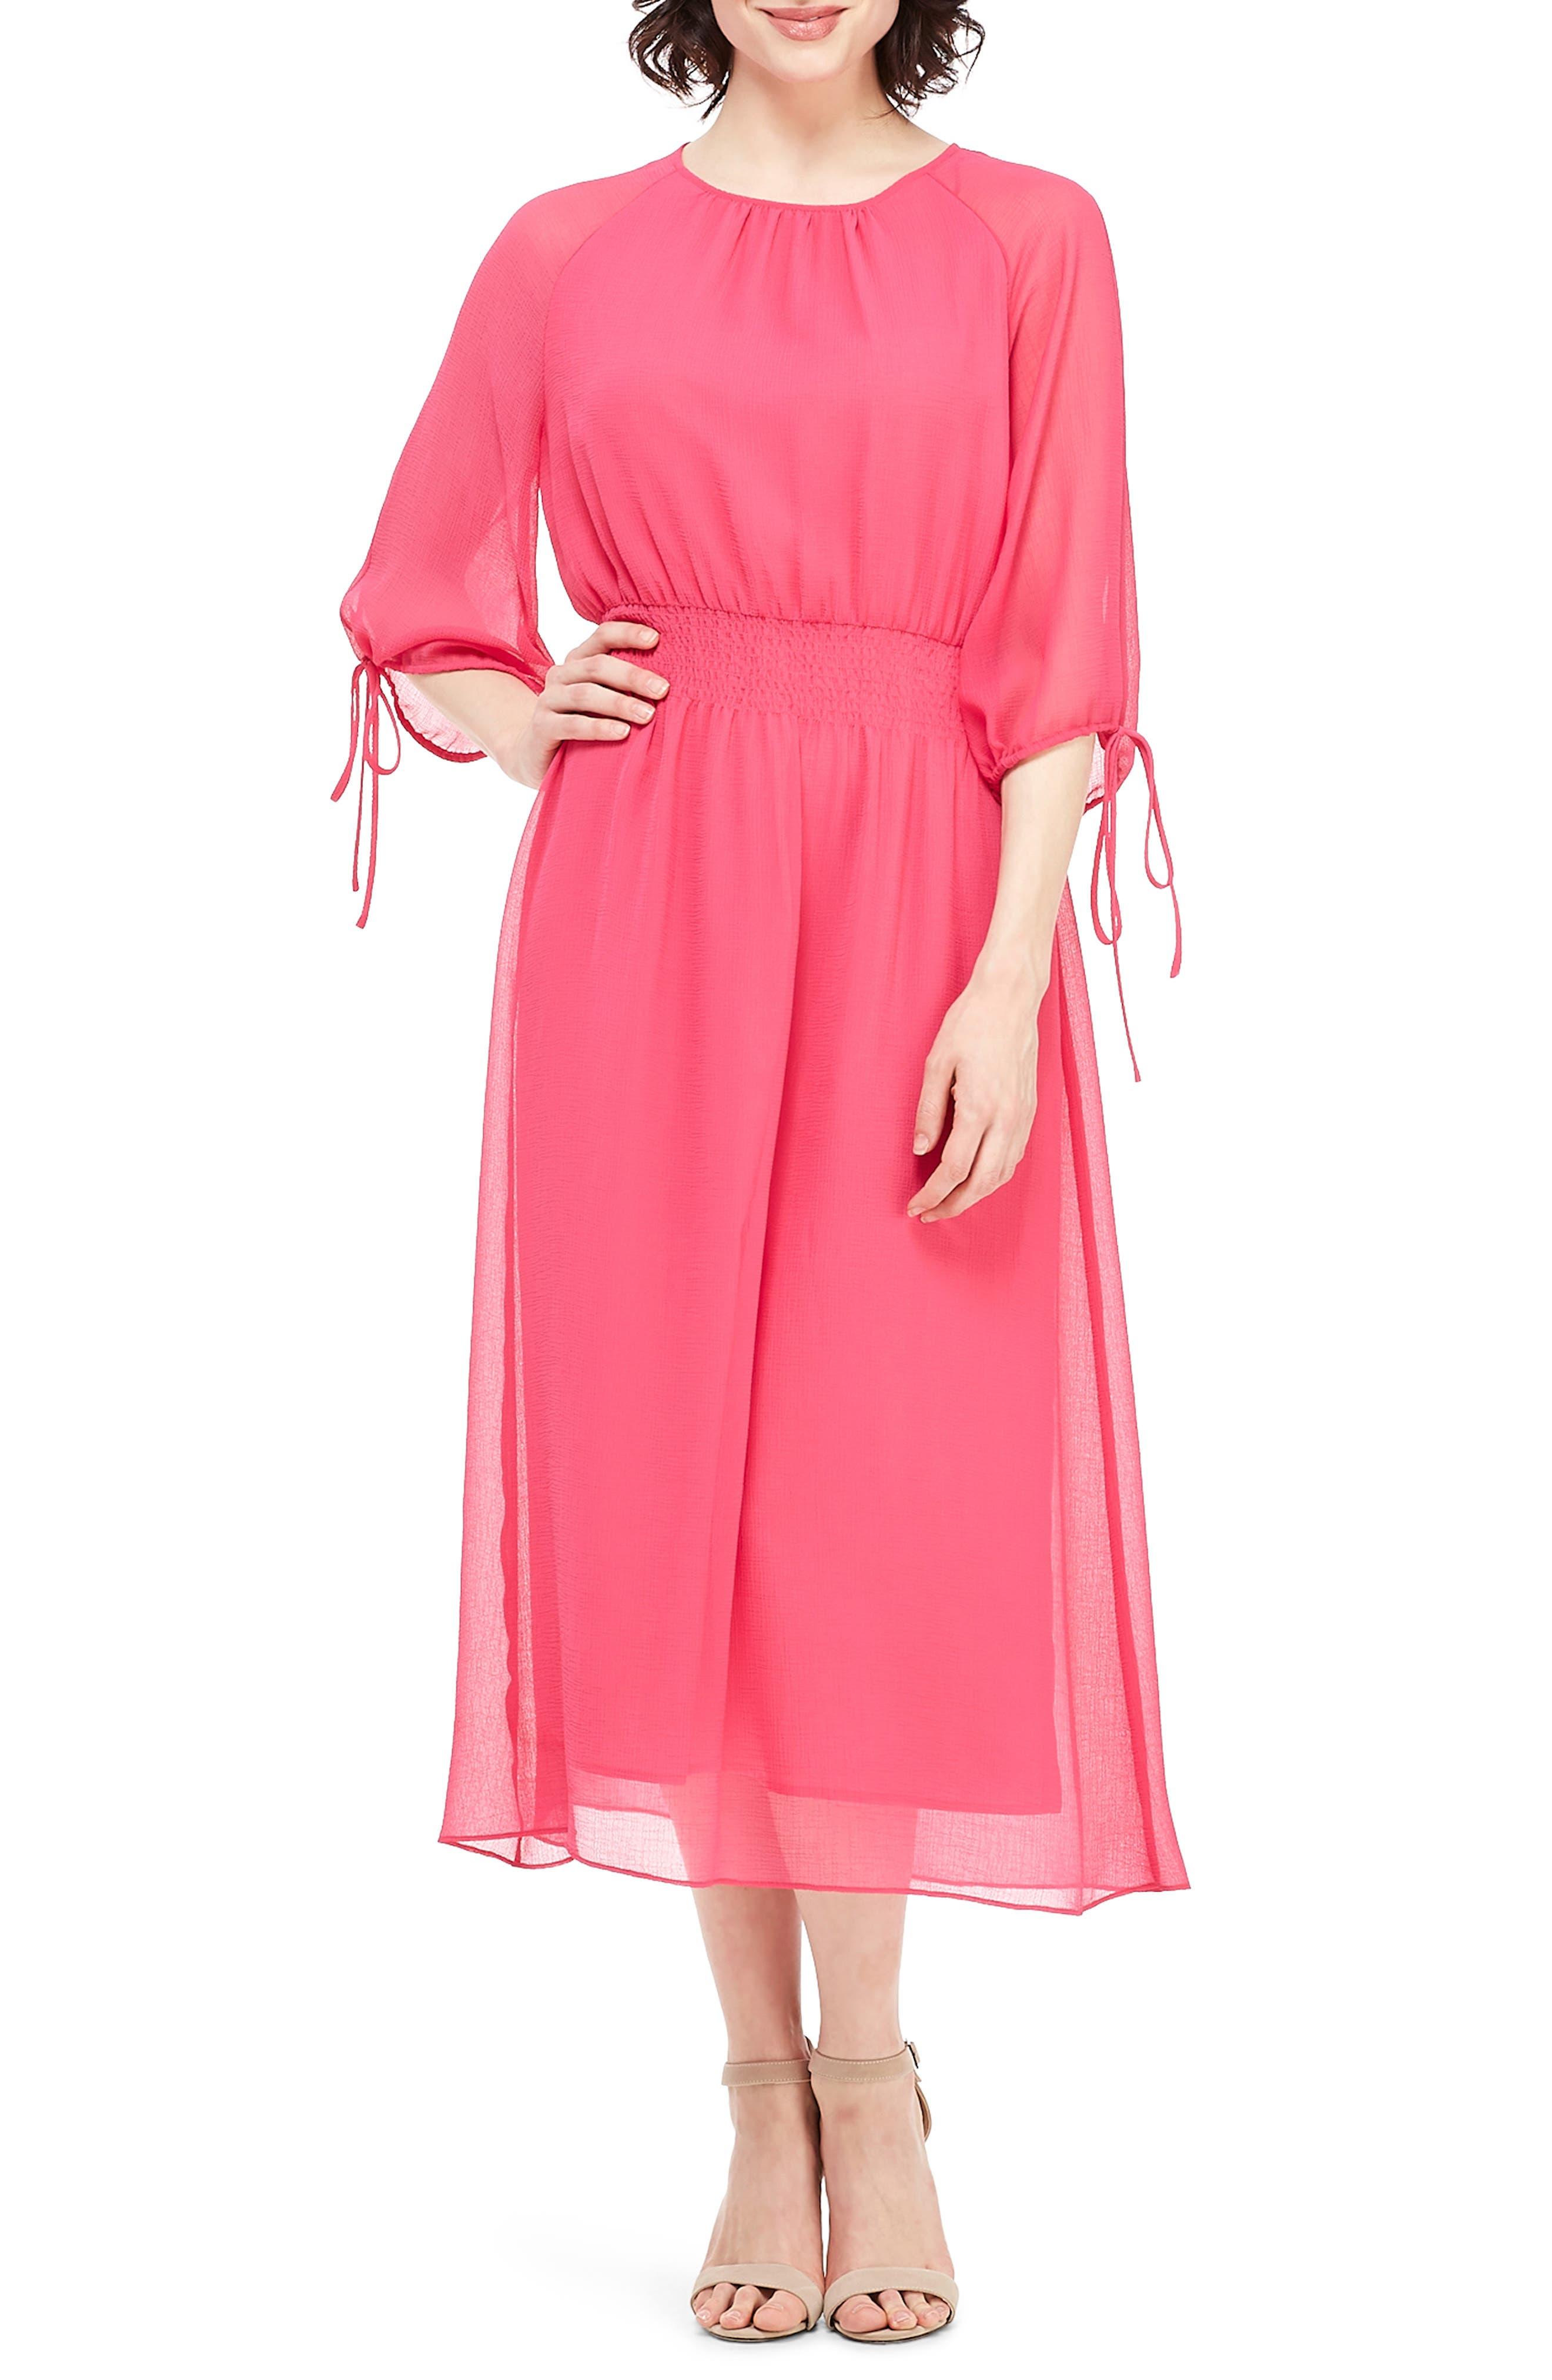 70s Dresses – Disco Dresses, Hippie Dresses, Wrap Dresses Womens Maggy London Smocked Chiffon Dress $138.00 AT vintagedancer.com